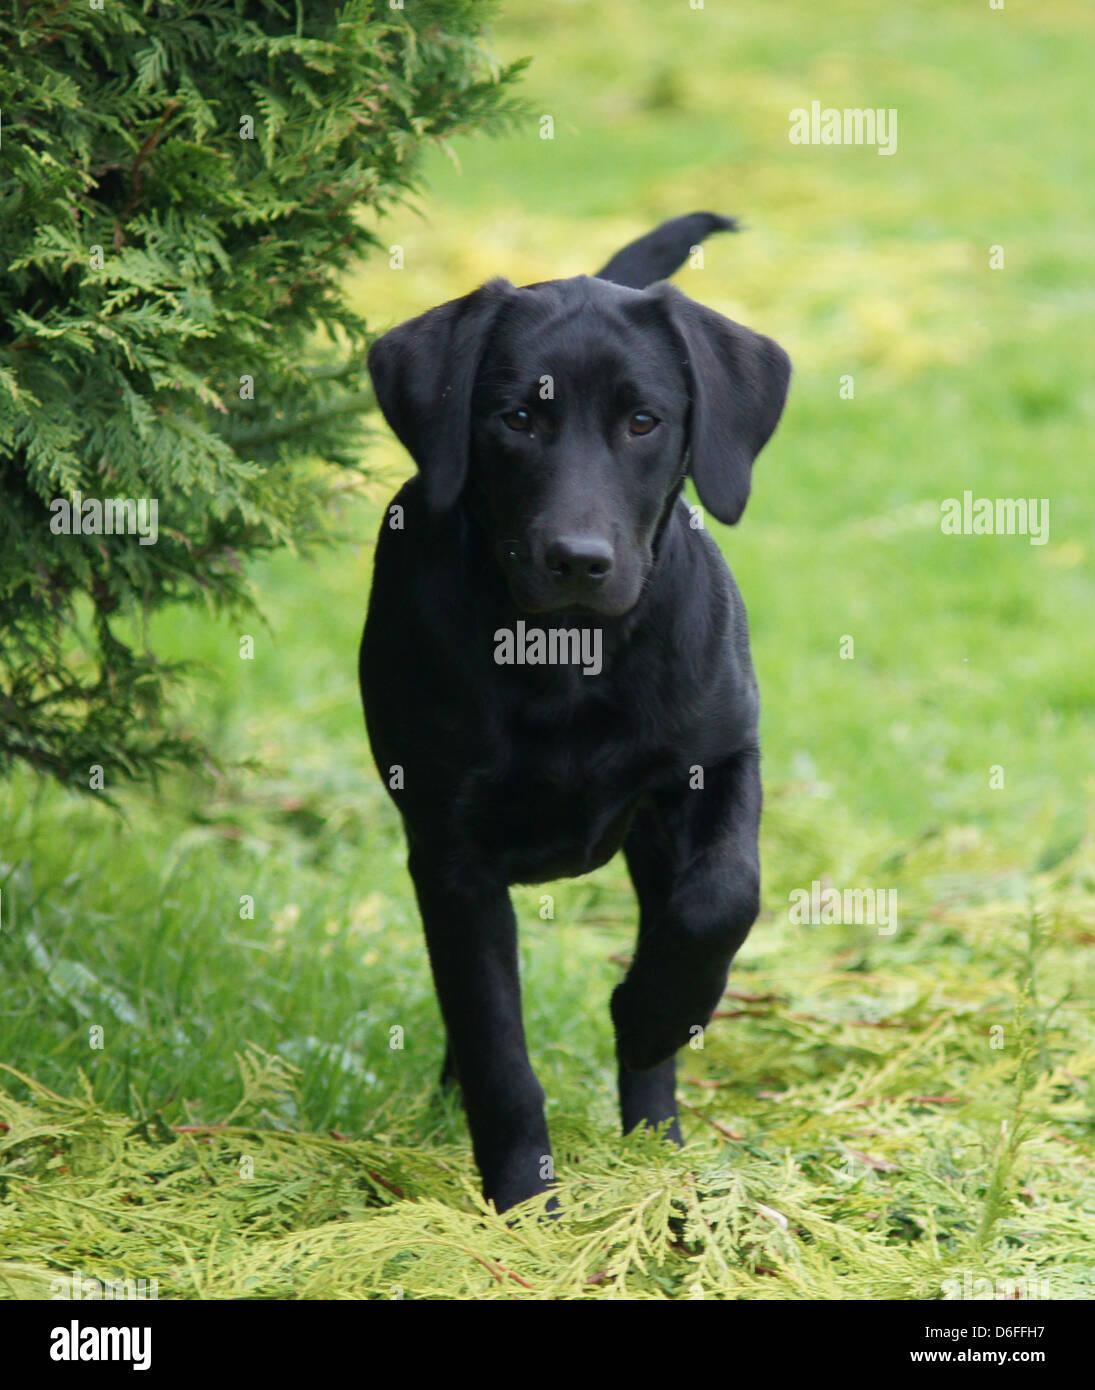 Six month old black Labrador Retriever puppy running towards camera - Stock Image